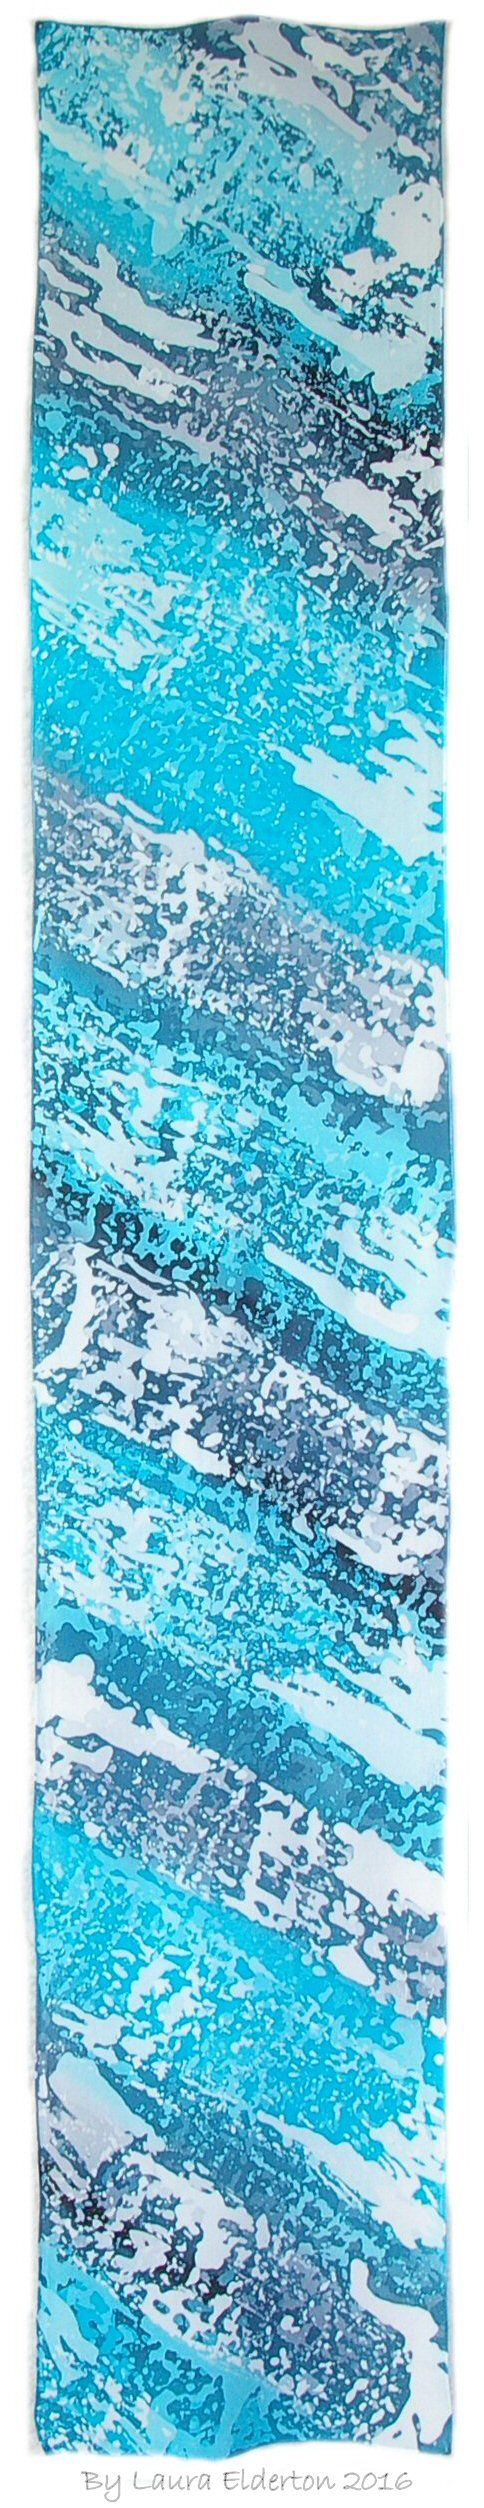 Hand dyed crepe de chine silk by Laura Elderton. Love this design so ocean like.